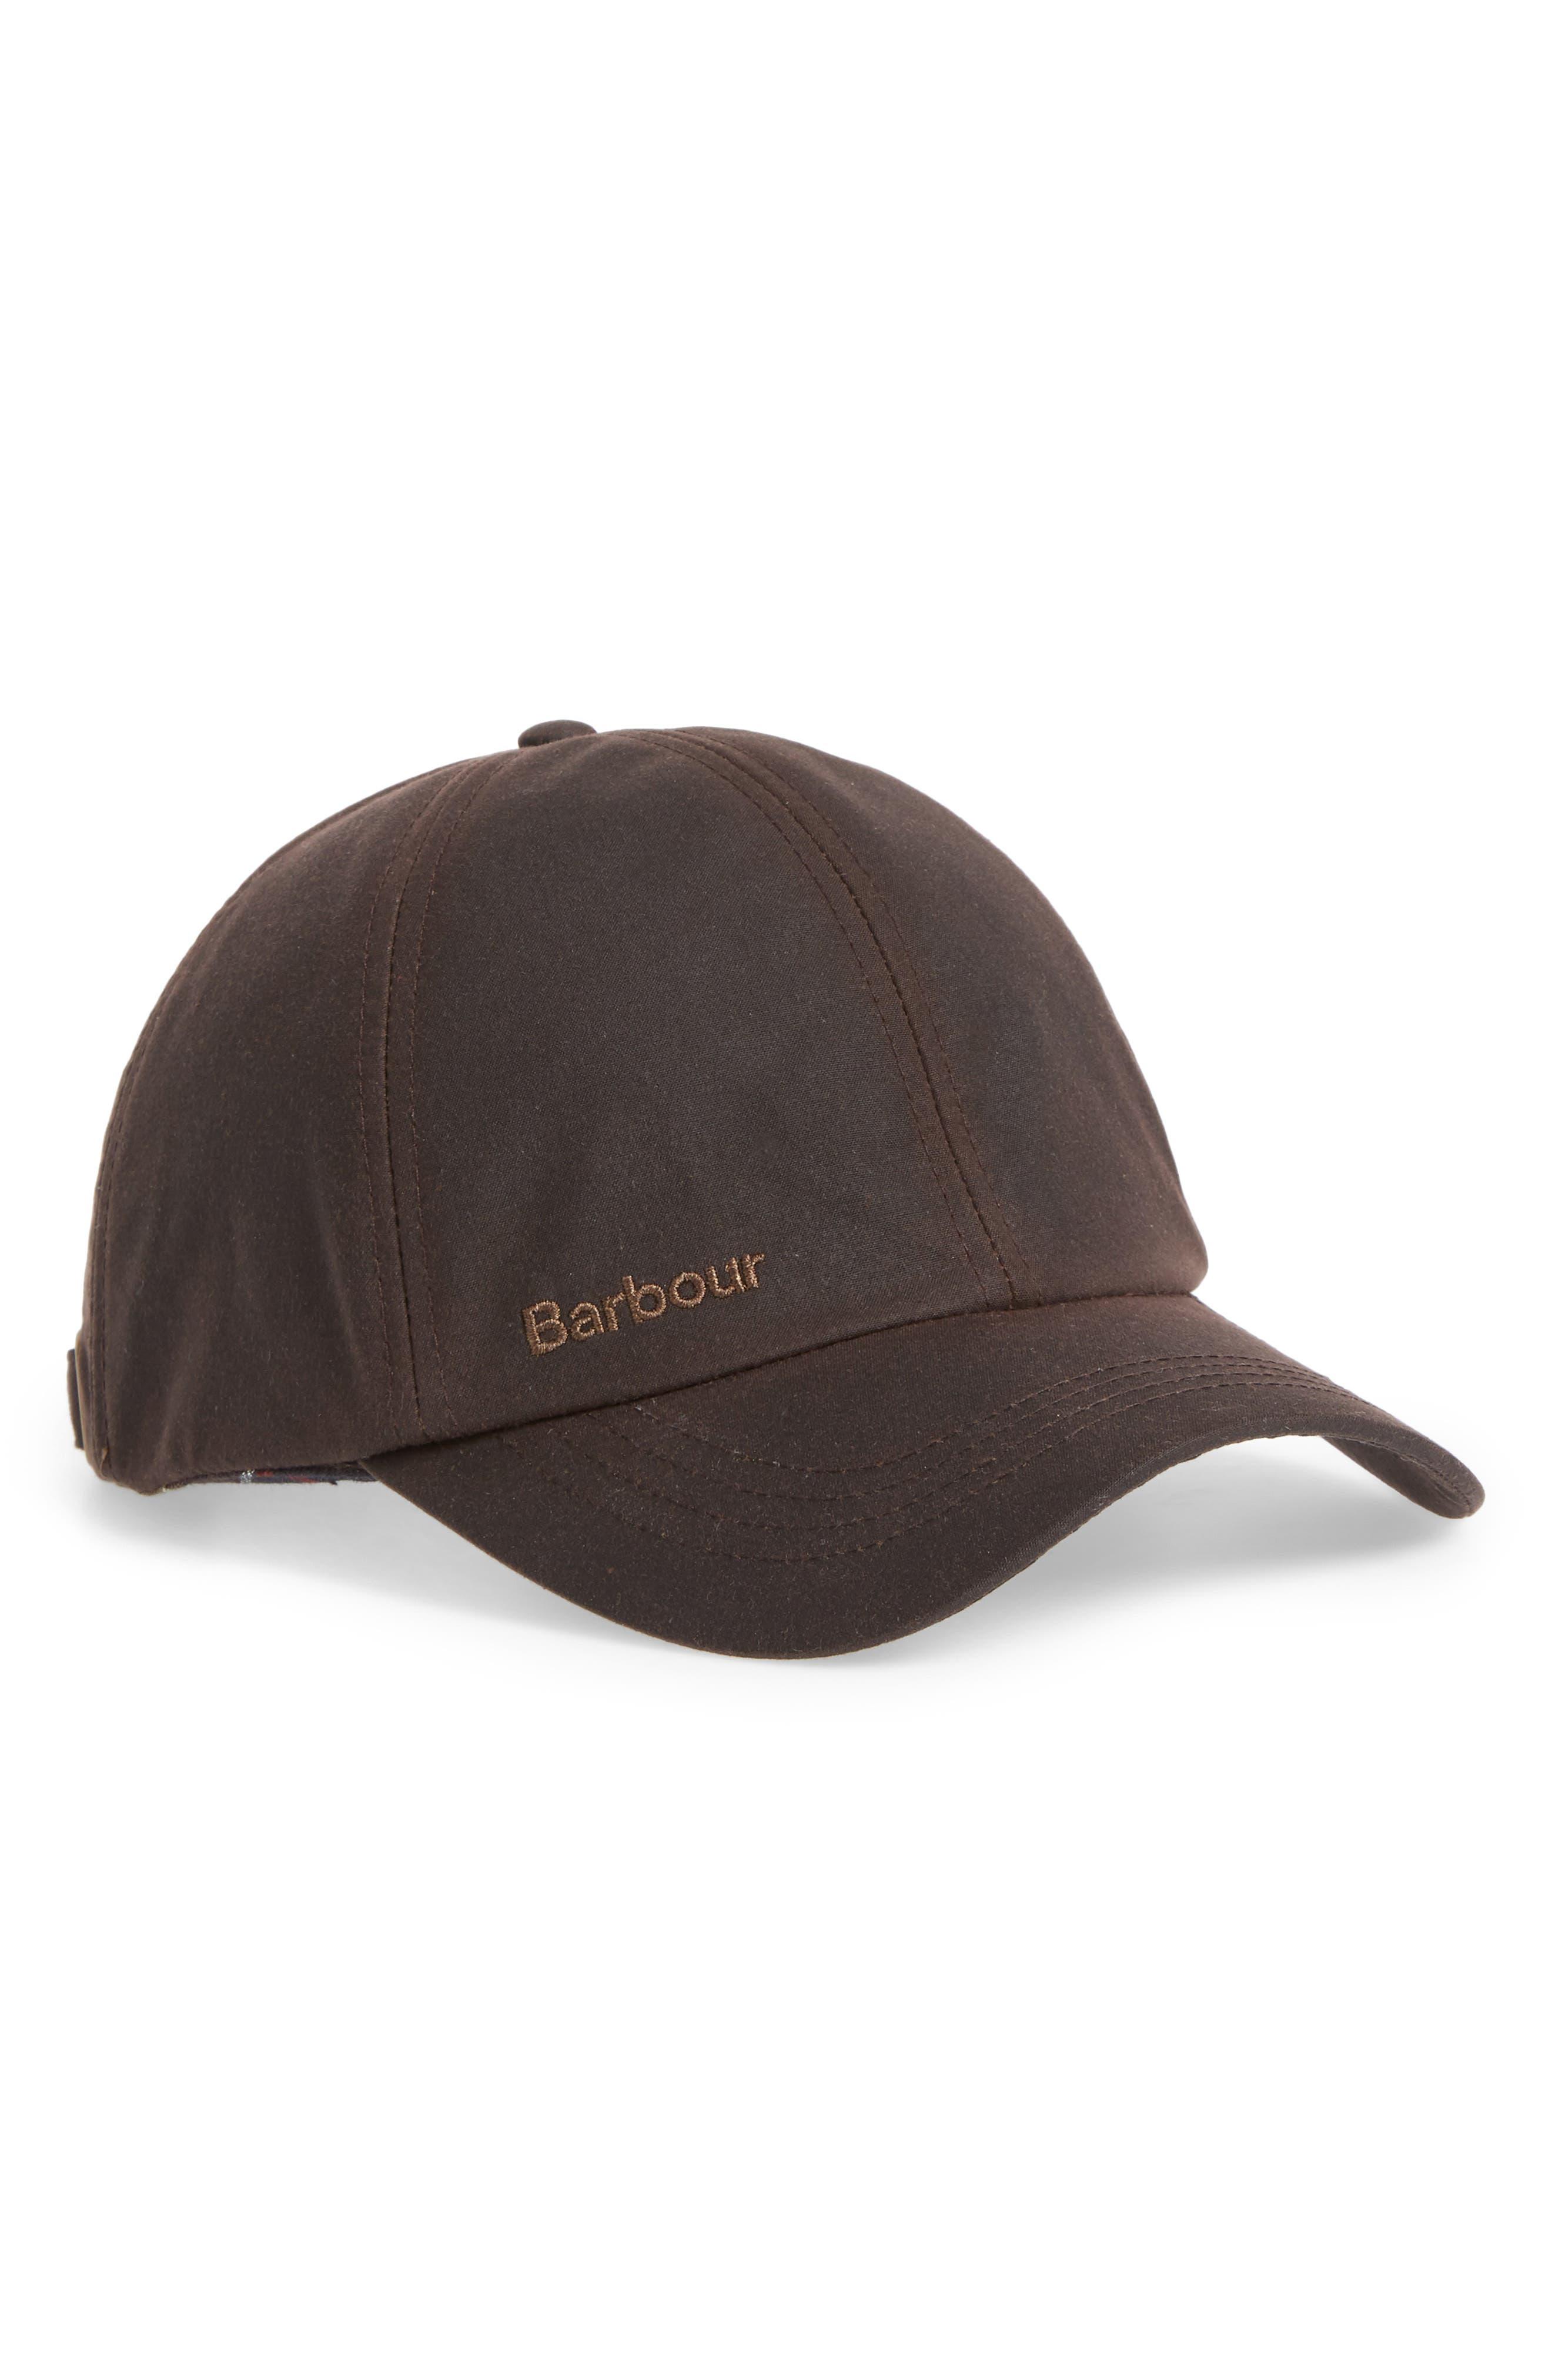 Prestbury Baseball Cap,                         Main,                         color, Brown